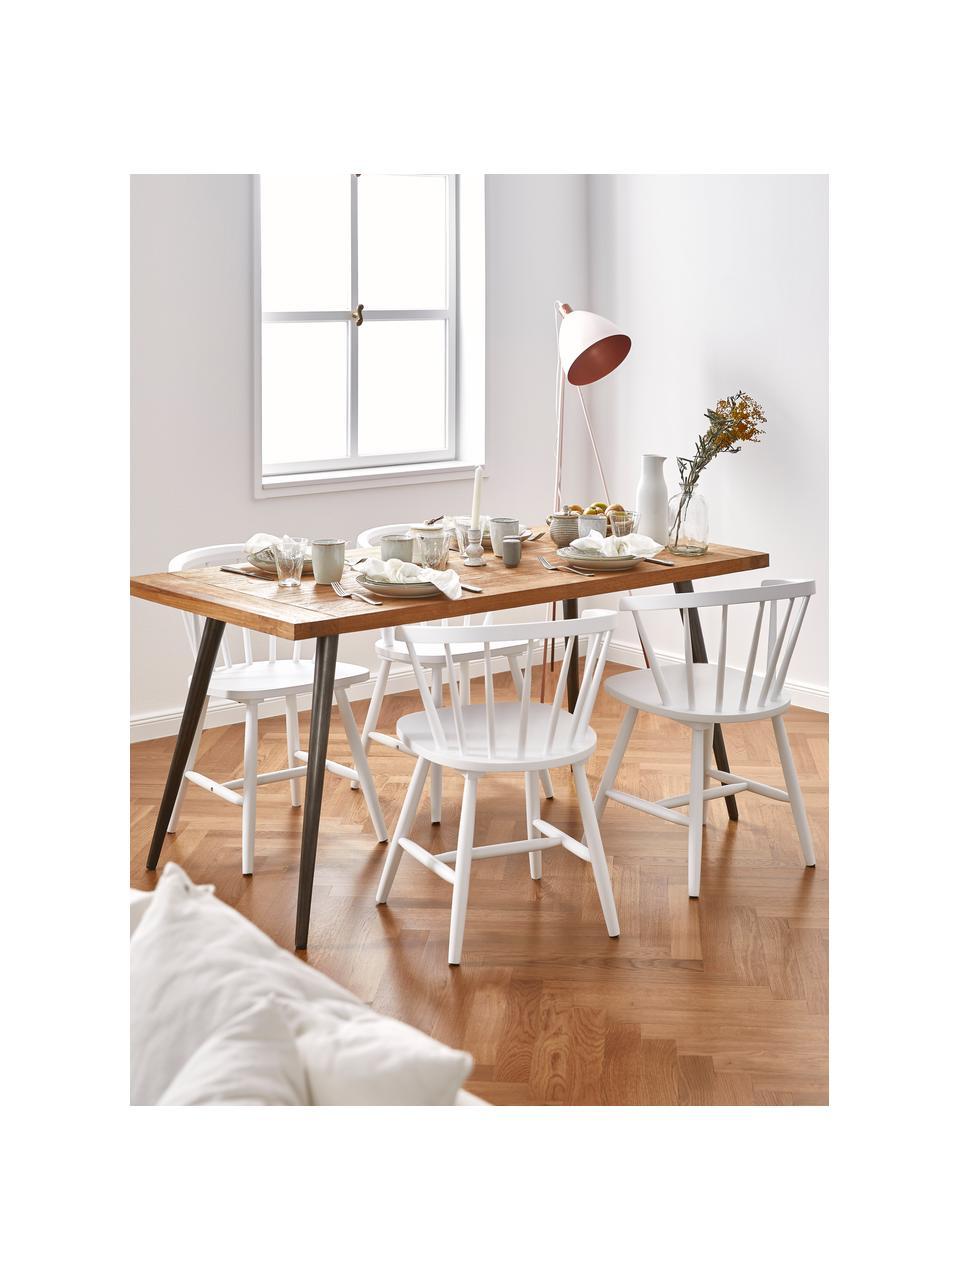 Windsor-Armlehnstühle Megan aus Holz, 2 Stück, Kautschukholz, lackiert, Weiß, B 53 x T 52 cm